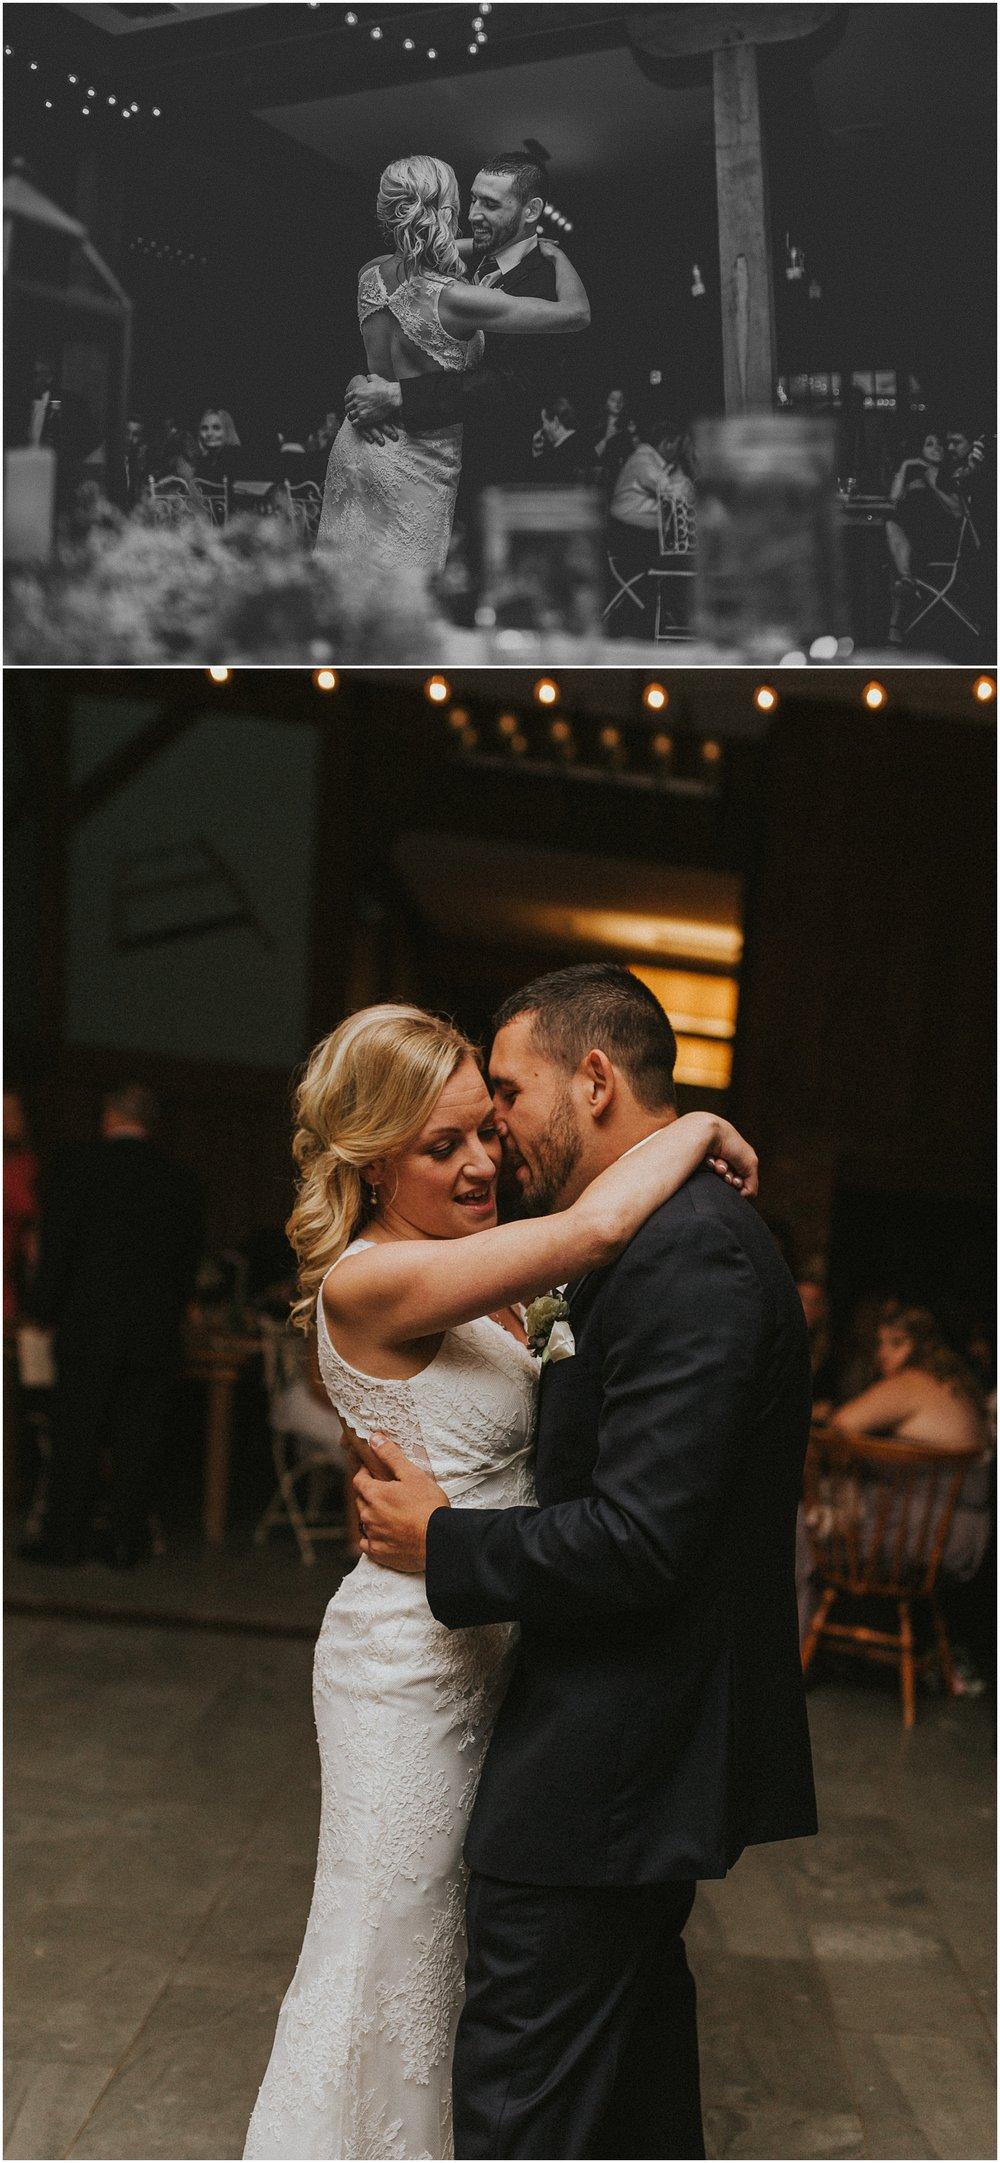 waterloo-village-waterloo village-wedding-outdoor wedding-rustic-boemian-new jersey-bride-groom-wedding party-davids bridal-wedding dress-wedding-first kiss-intimate wedding_0396.jpg